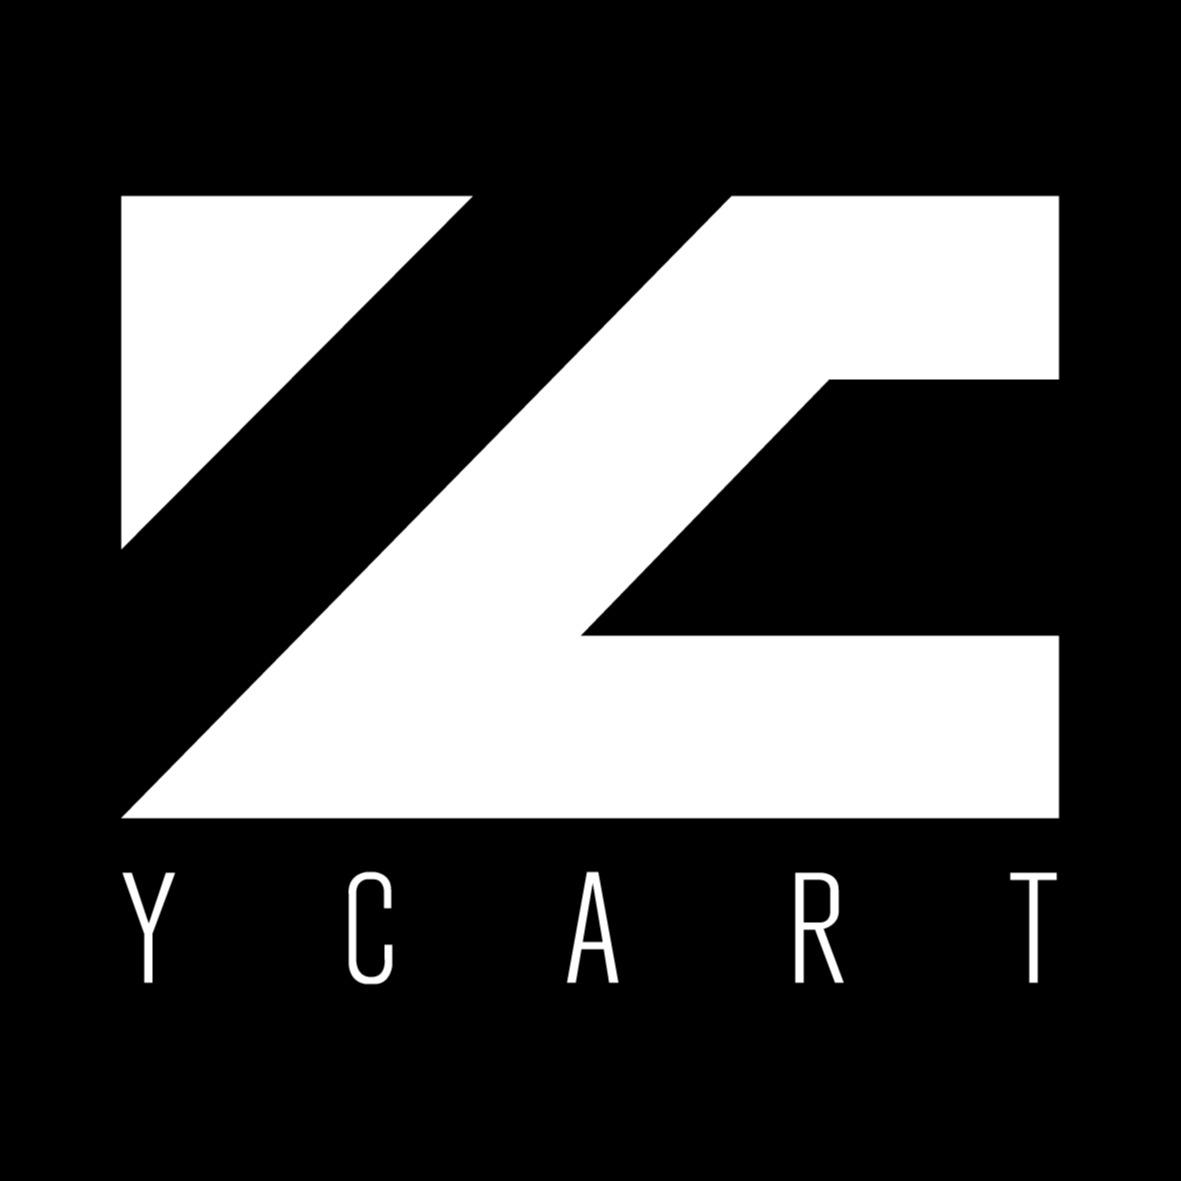 YCART